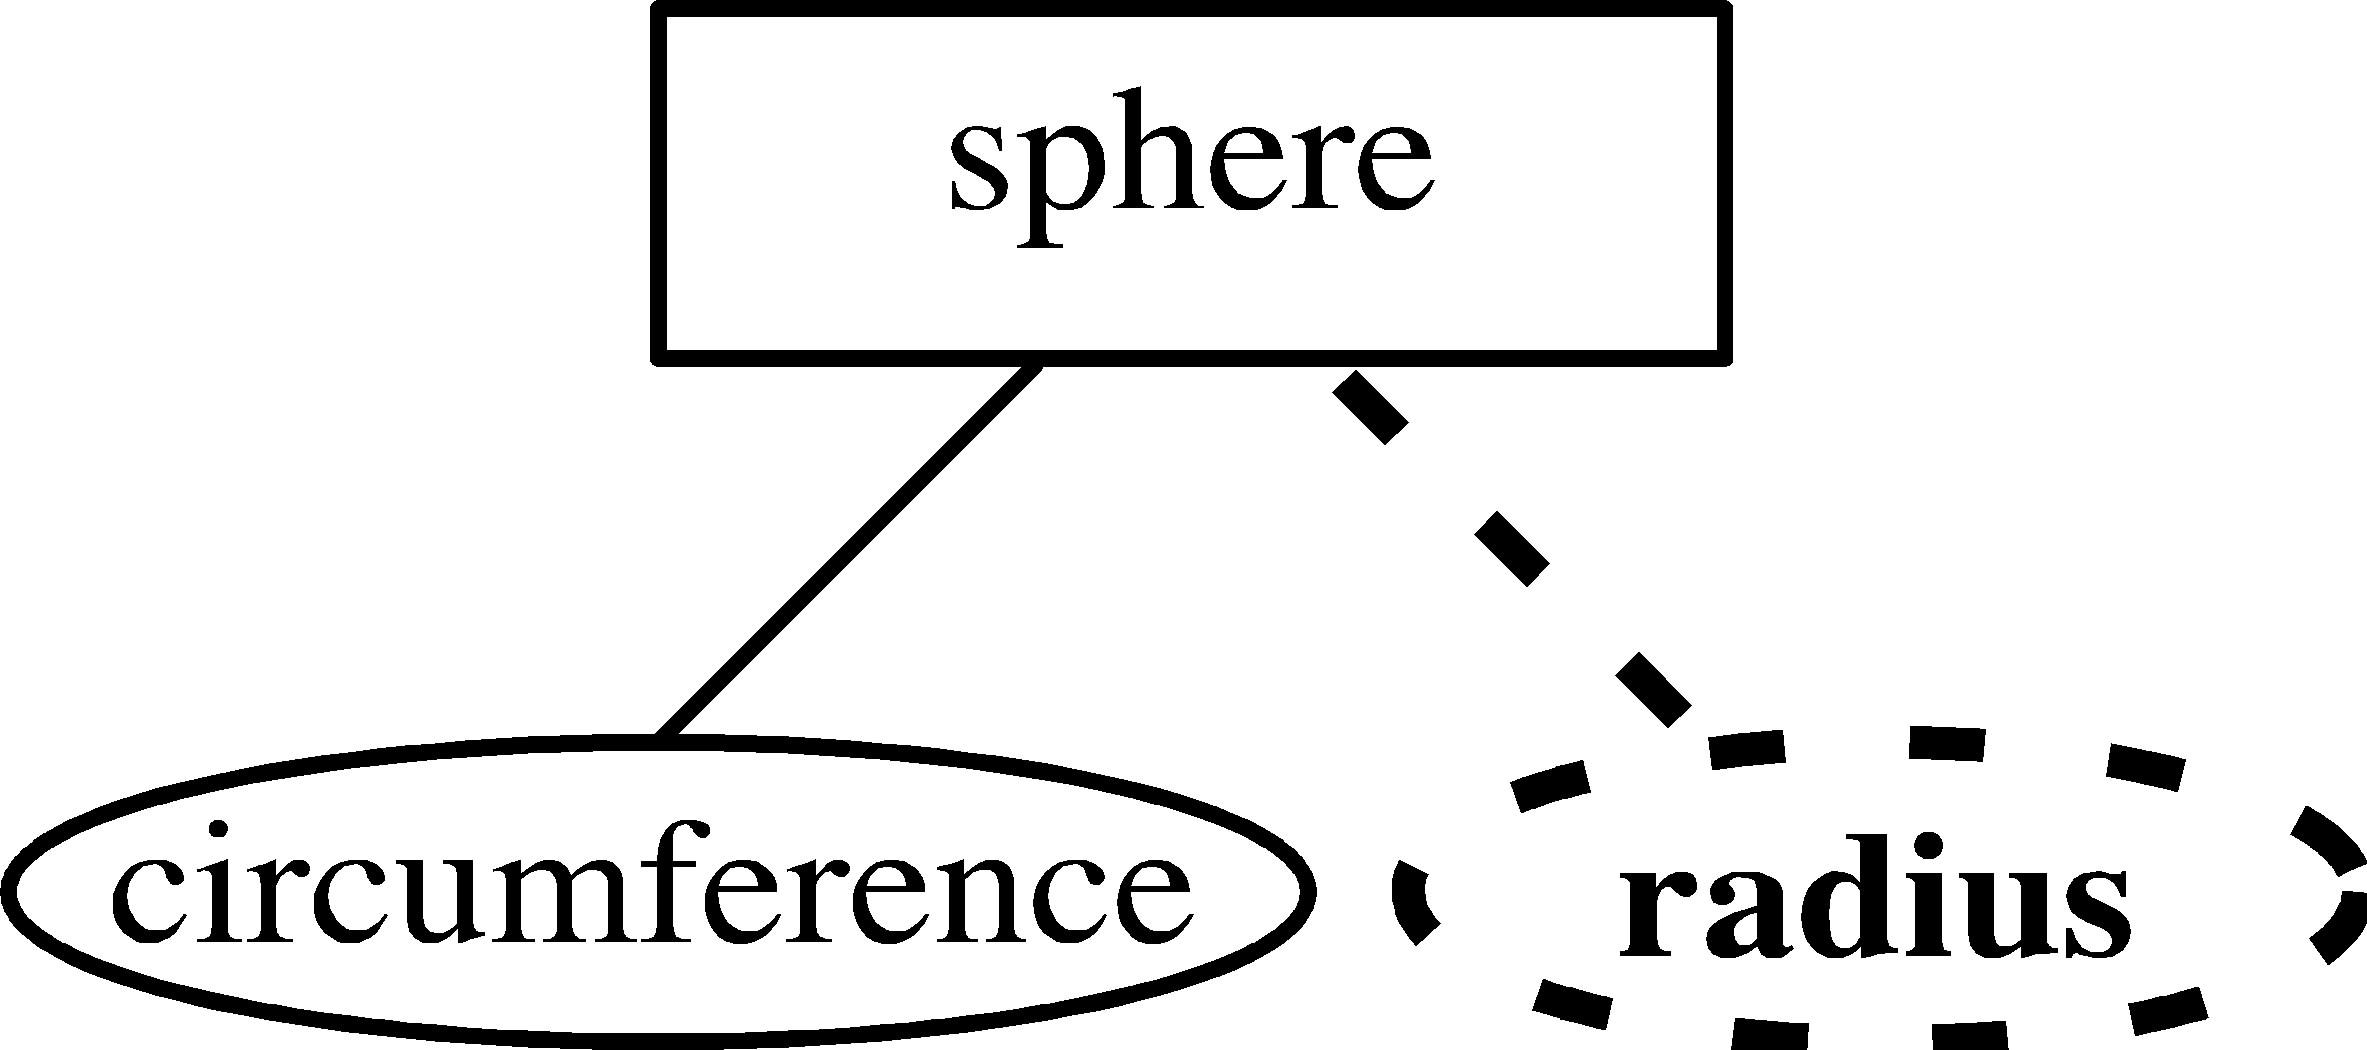 Entity-Relationship Model inside Double Line In Er Diagram